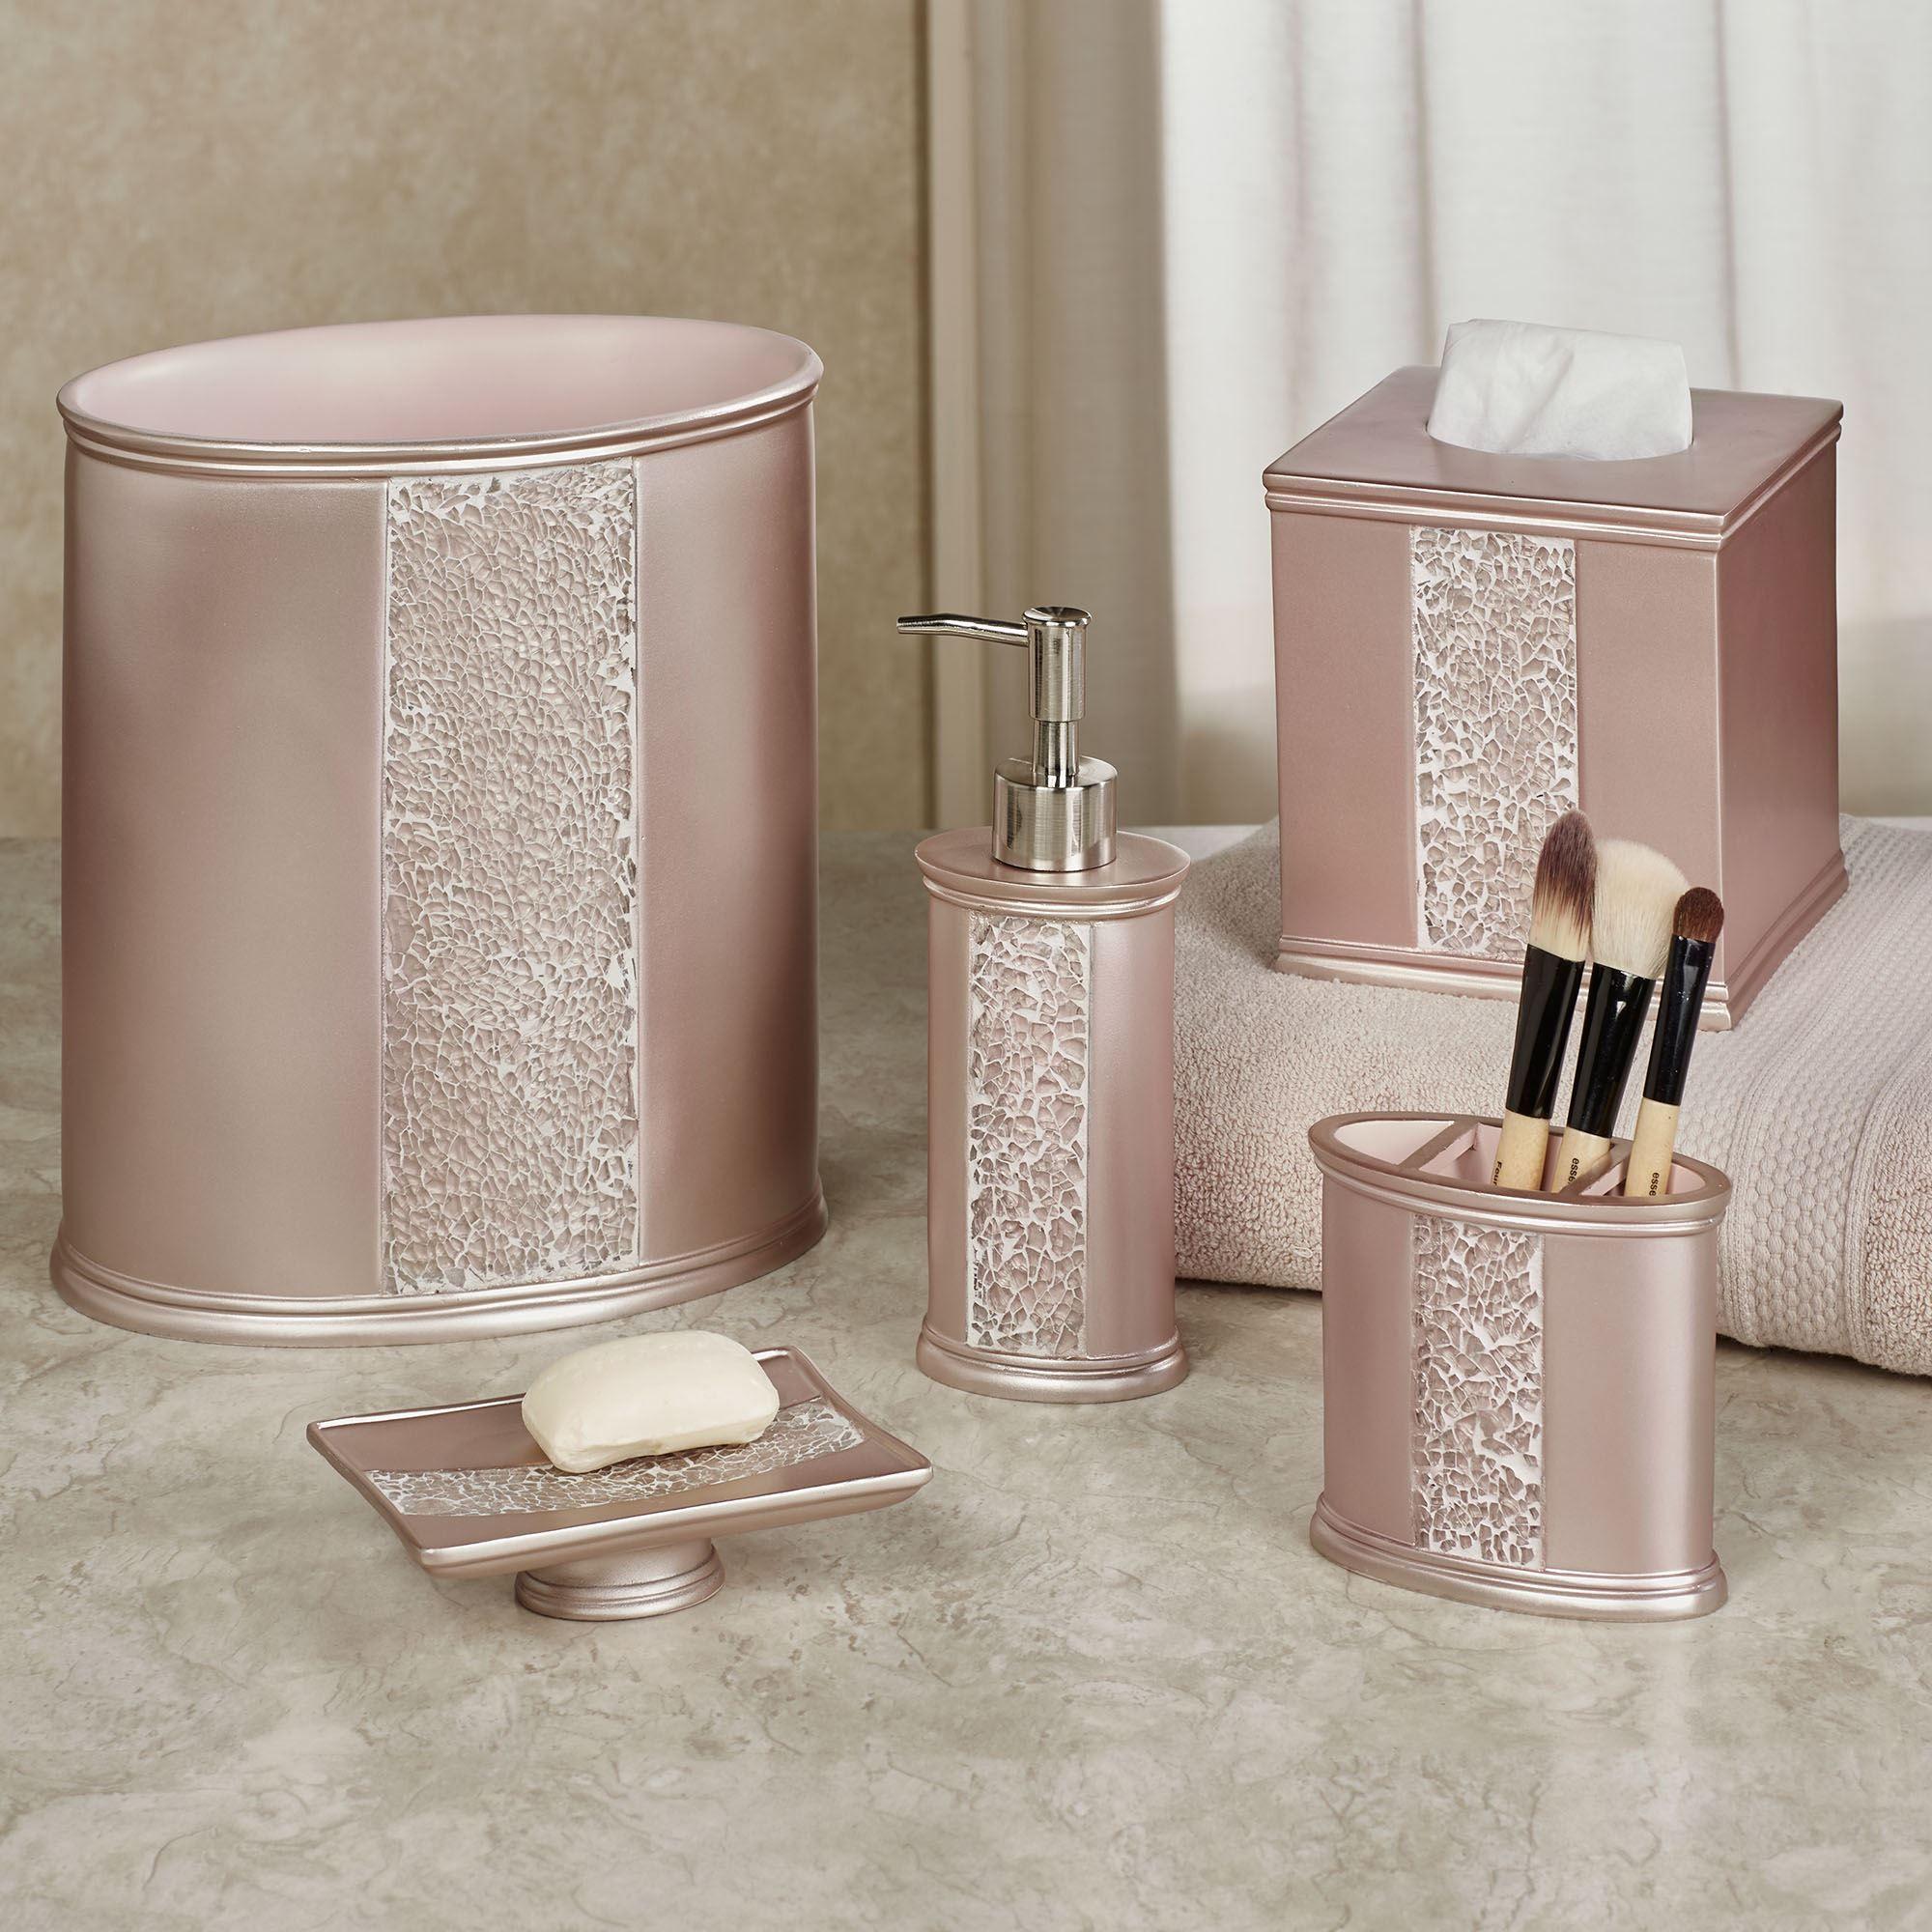 Sinatra Pale Blush Mosaic Bath Accessories, Sinatra Bathroom Accessories